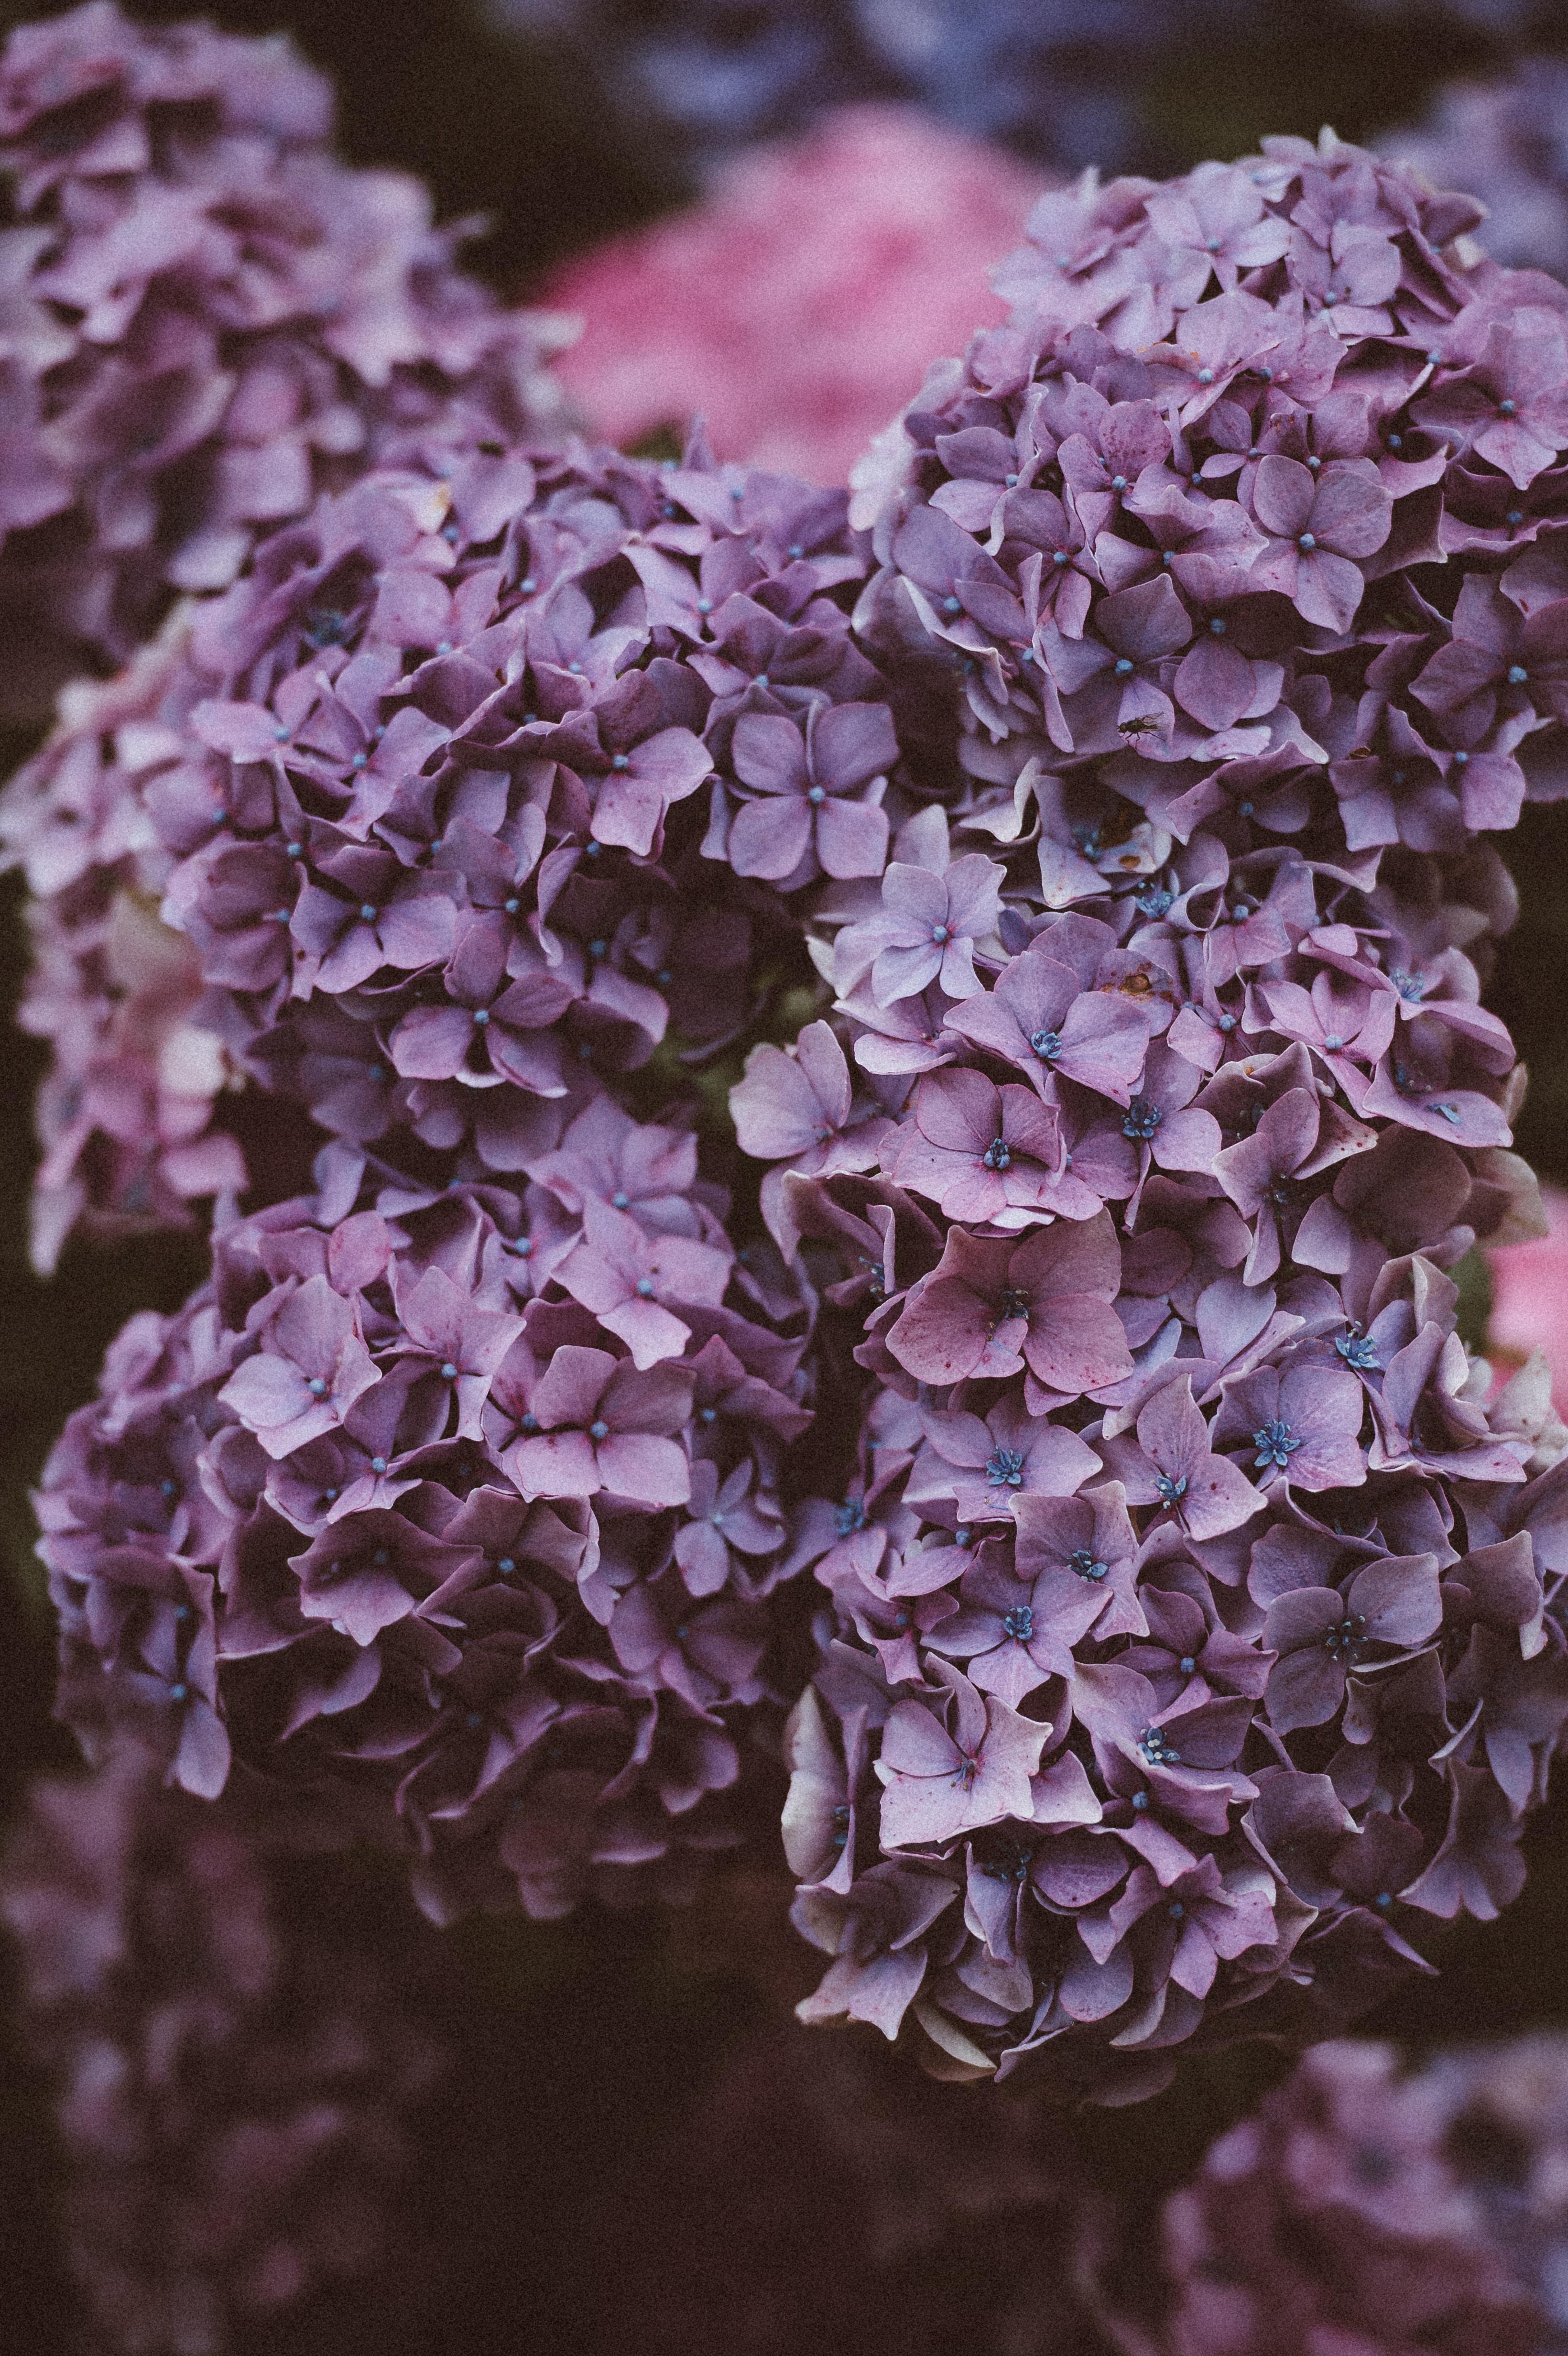 close-up photo of Hydrangea flowers